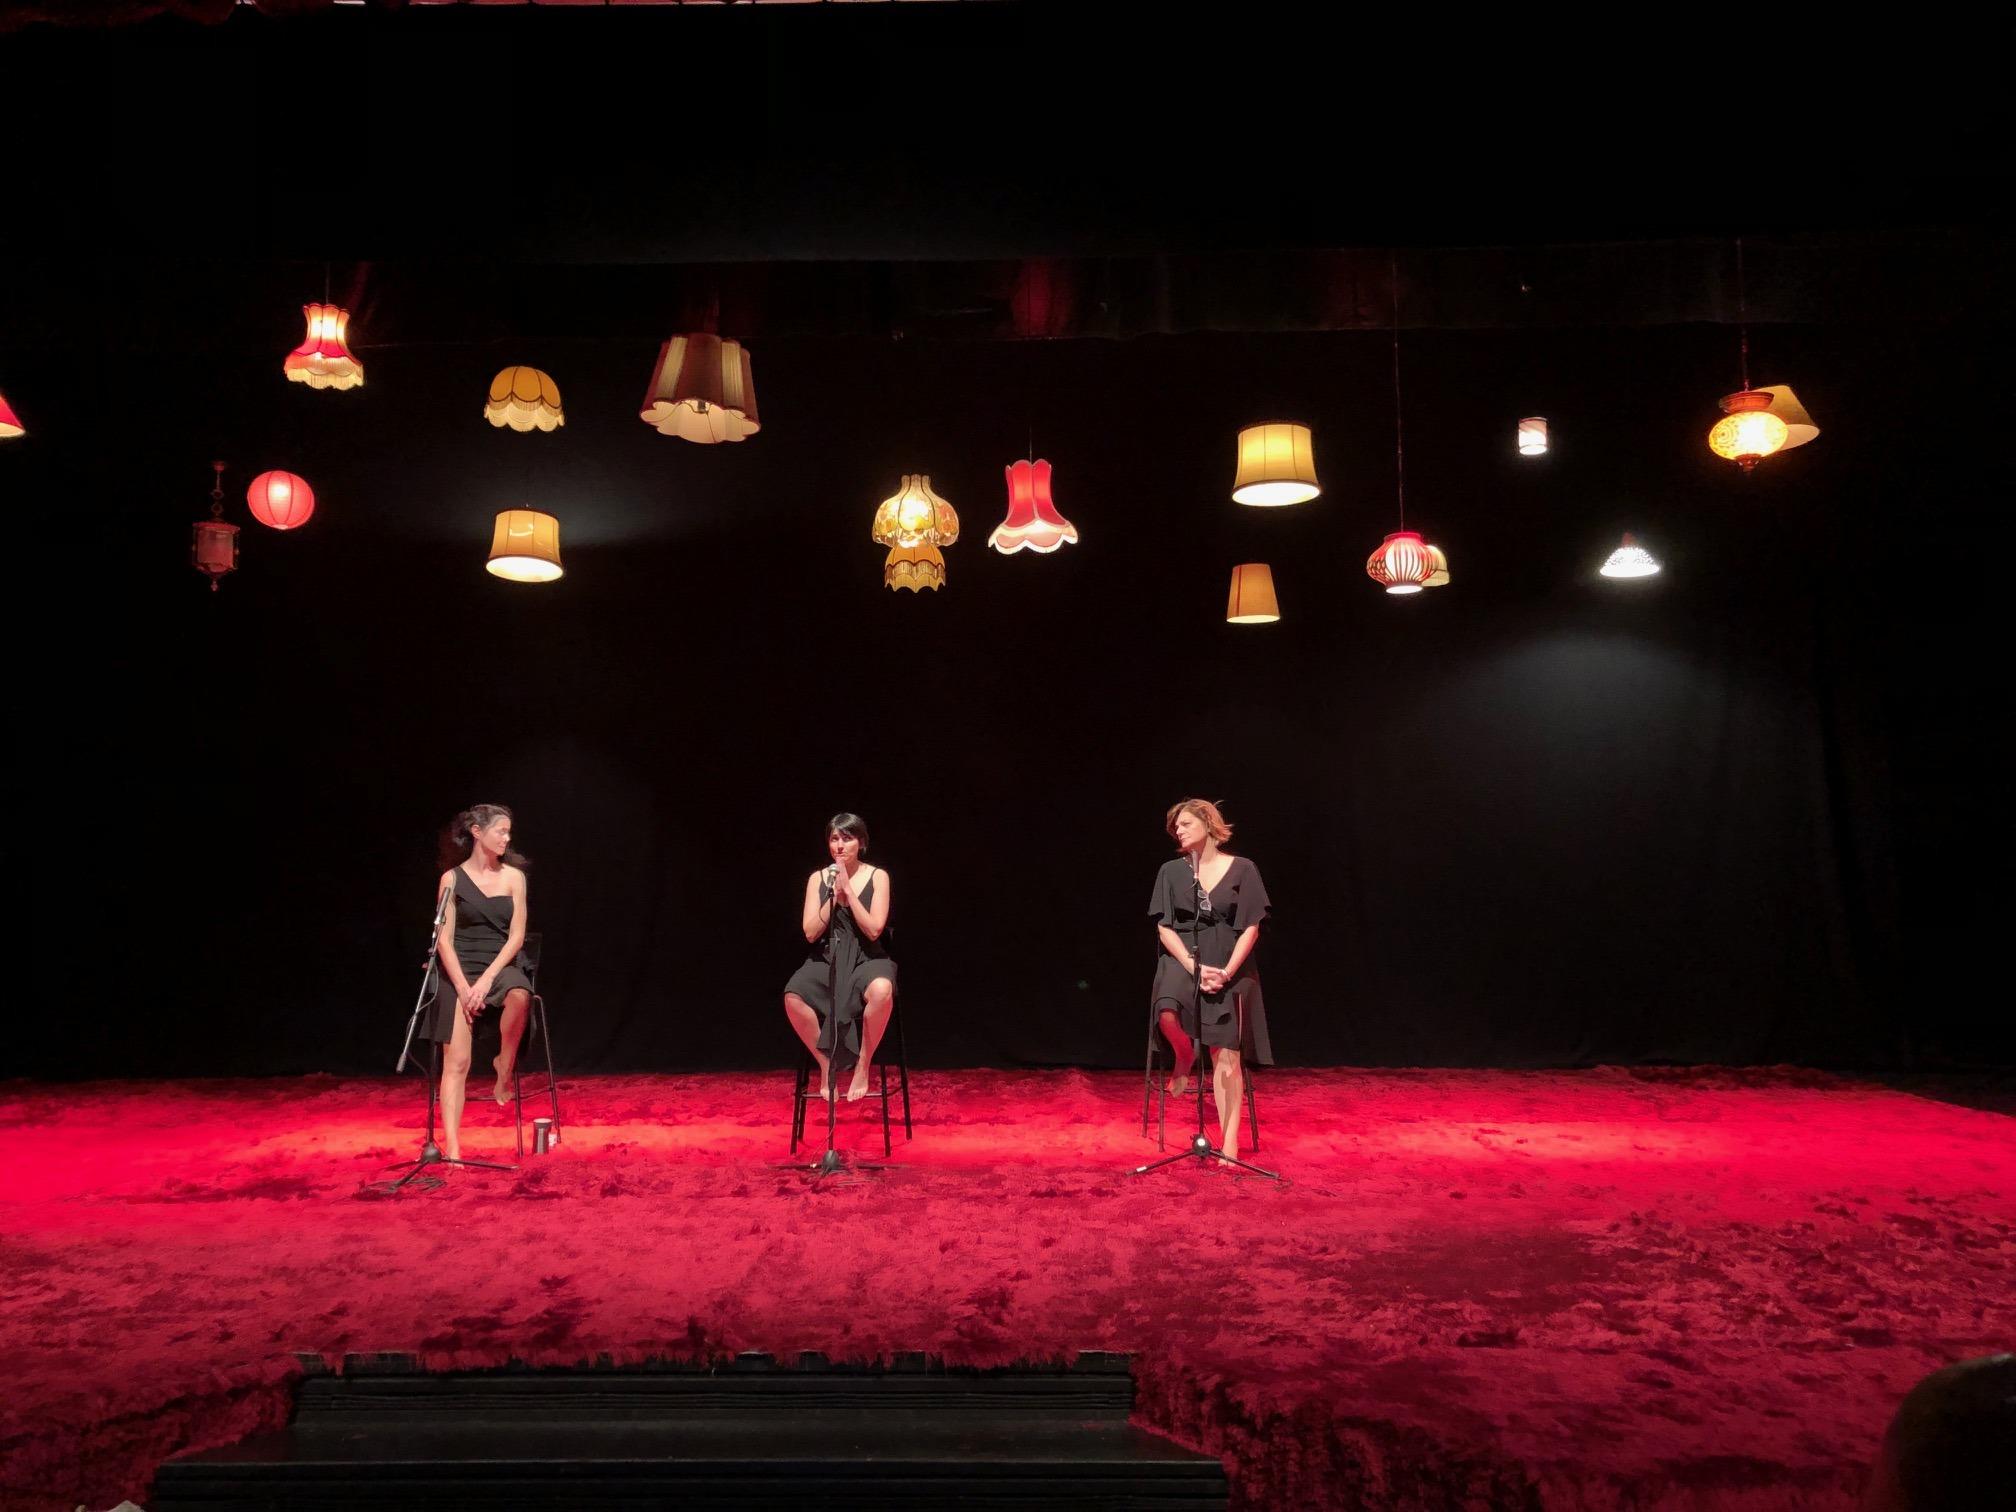 Ana Paula Rocha - Teatro - Monólogos da Vagina – Março 2019 - 002